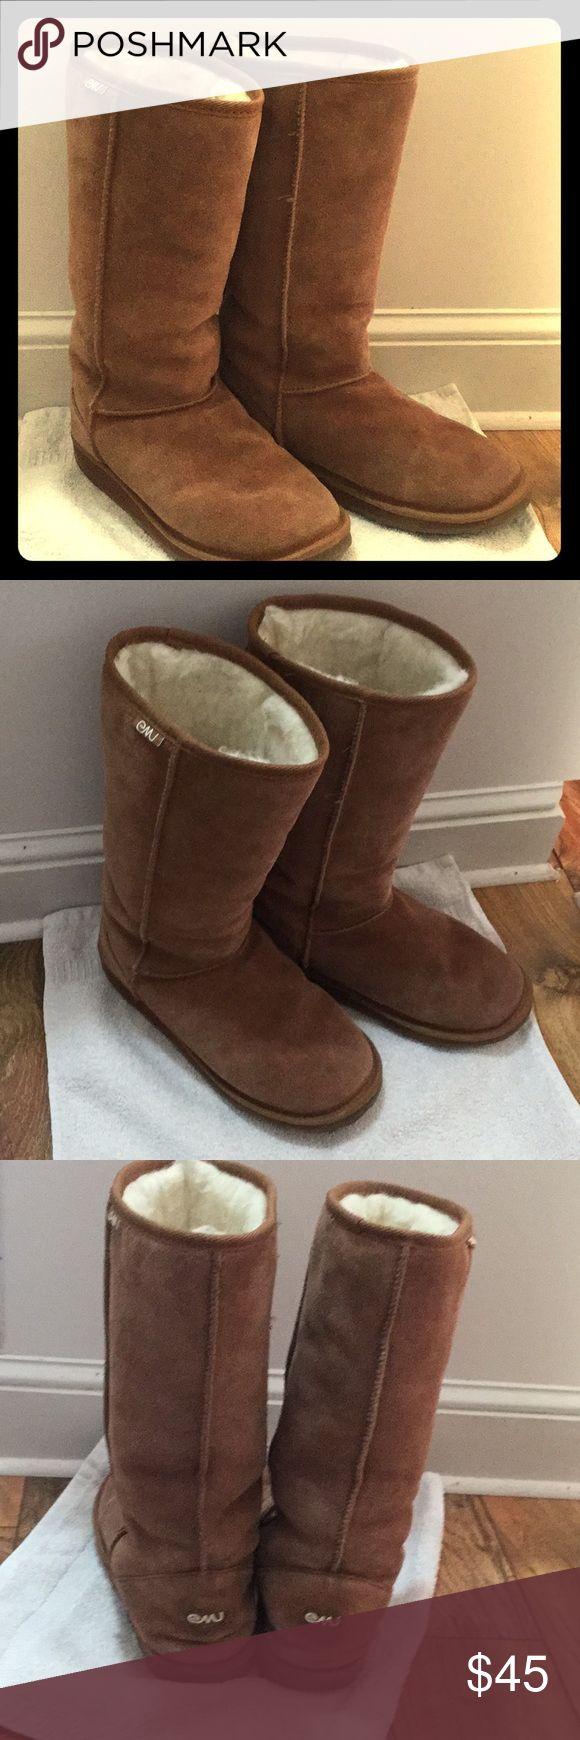 ⭐️WINTER SALE⭐️ Tall Emu Boots Tall Emu Boots Tan Inside is still fluffy Very little wear Emu Shoes Winter & Rain Boots